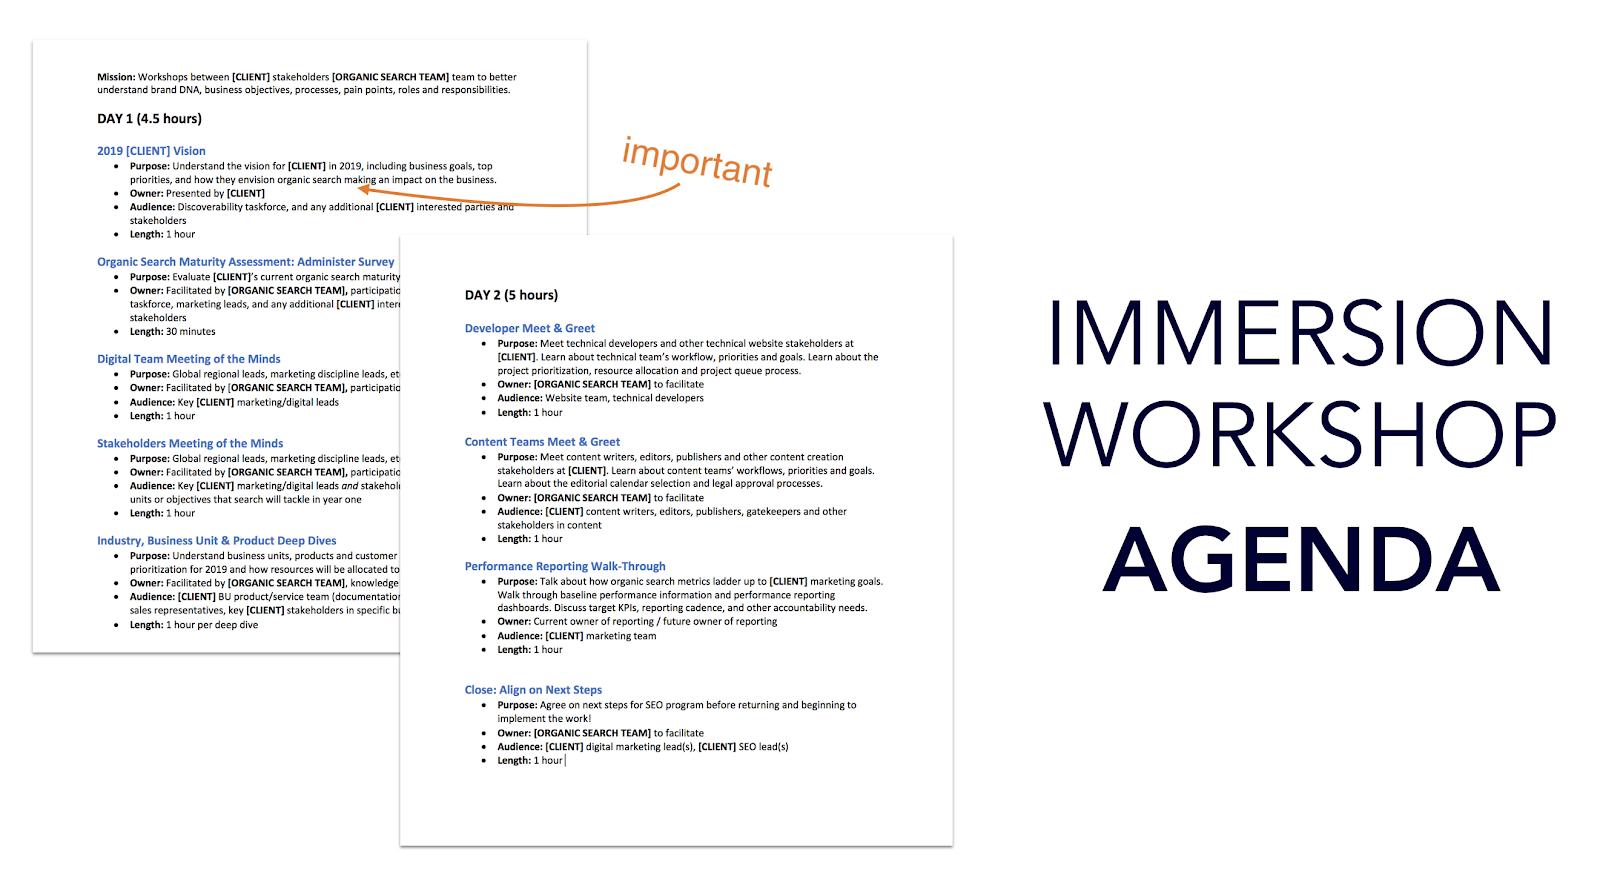 Immersion workshop agenda